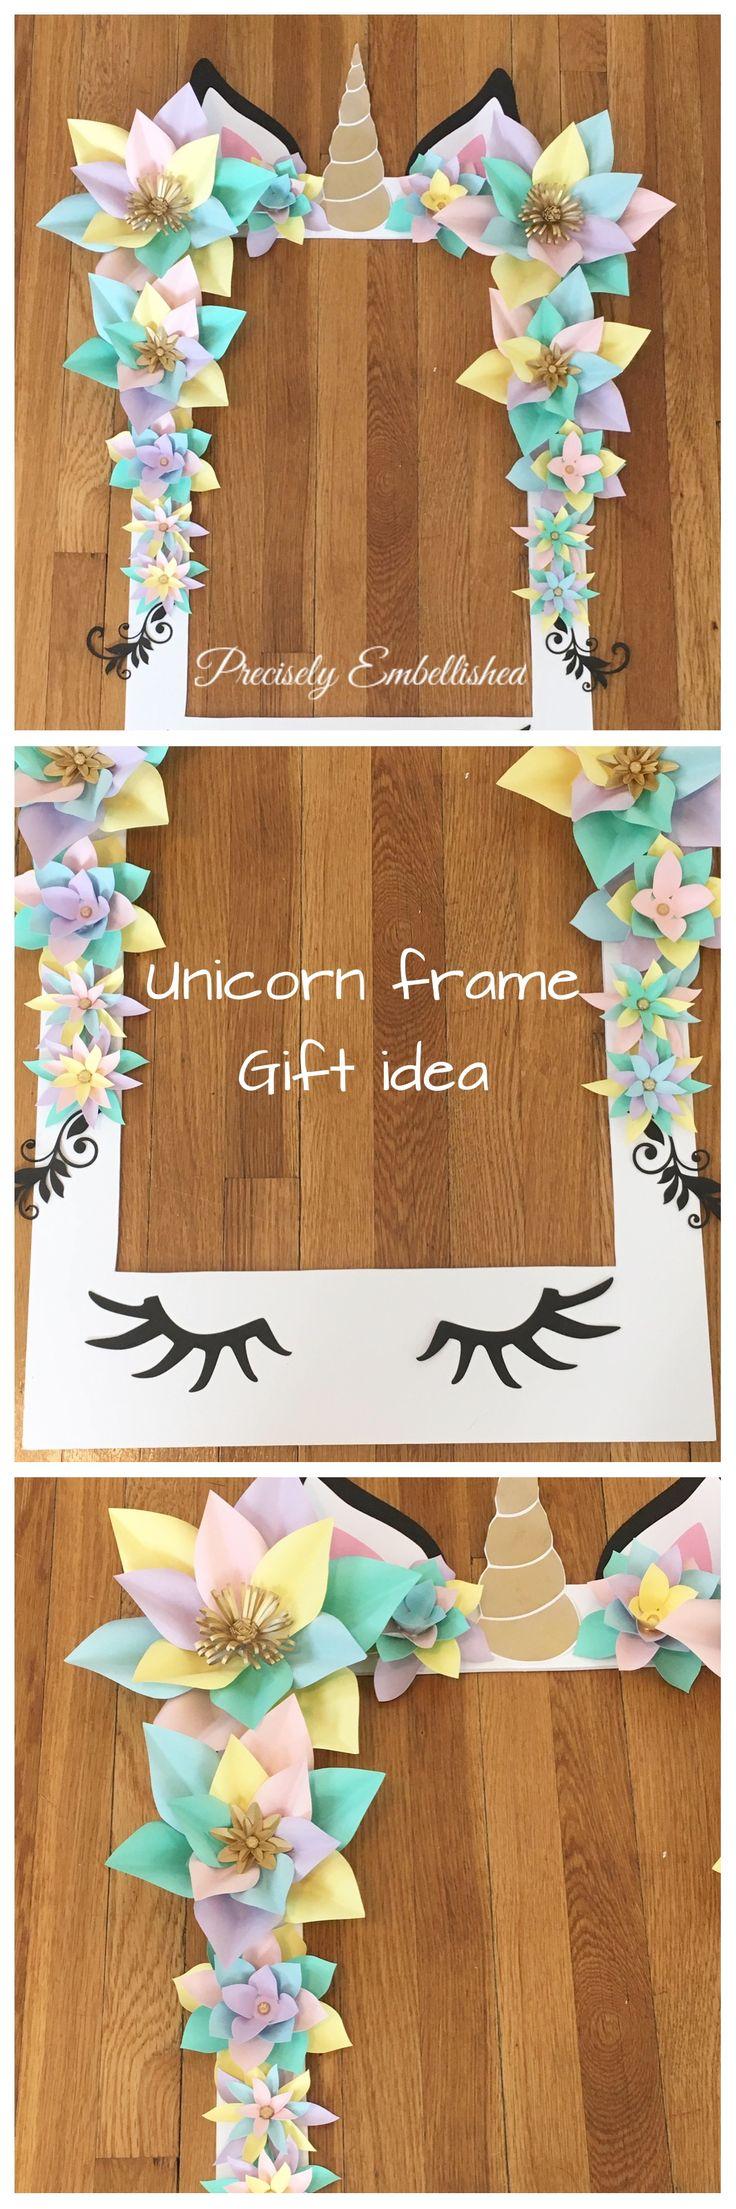 Unicorn frame - gift idea - party idea - idea for kids - photoframe #ad #eenhoorn #flower #pastel #craft #made #diy #wedding #birthday